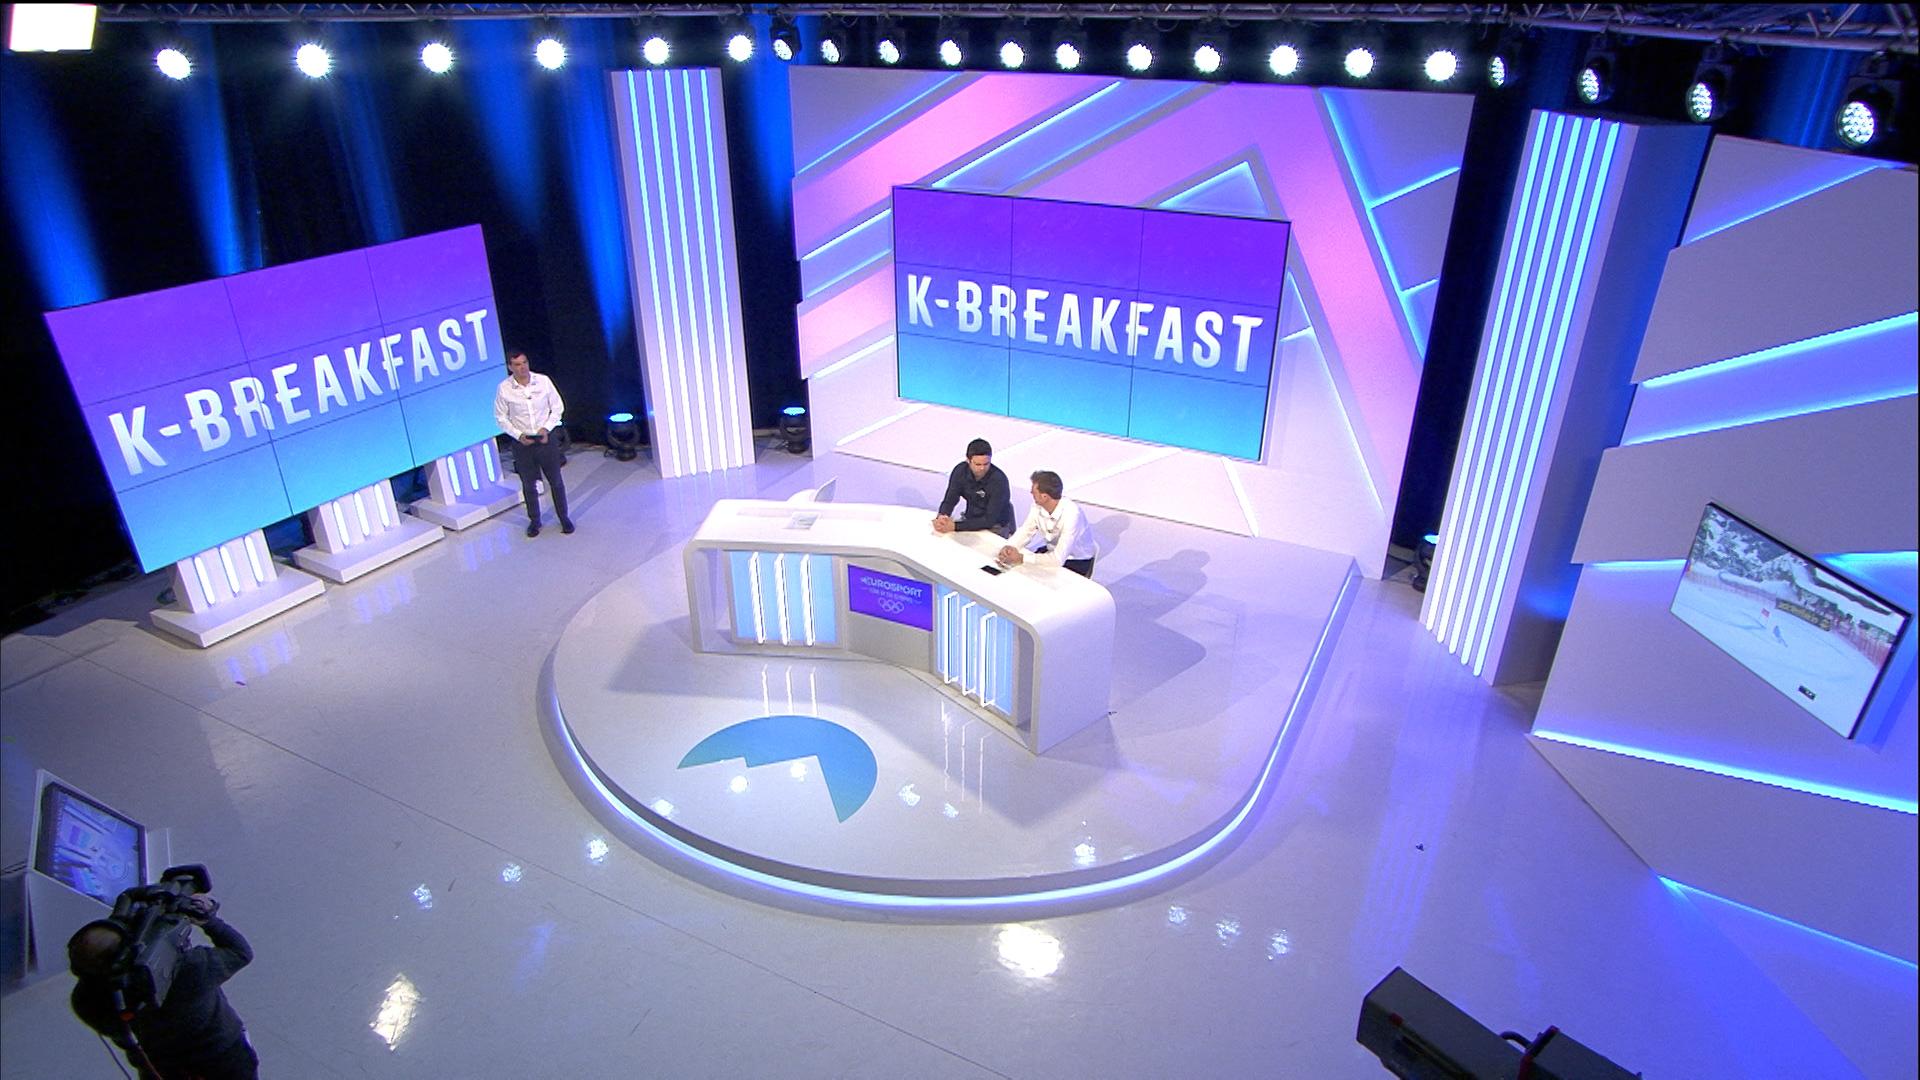 ncs_eurosport-pyeongchang-olympic-tv-studio_0013